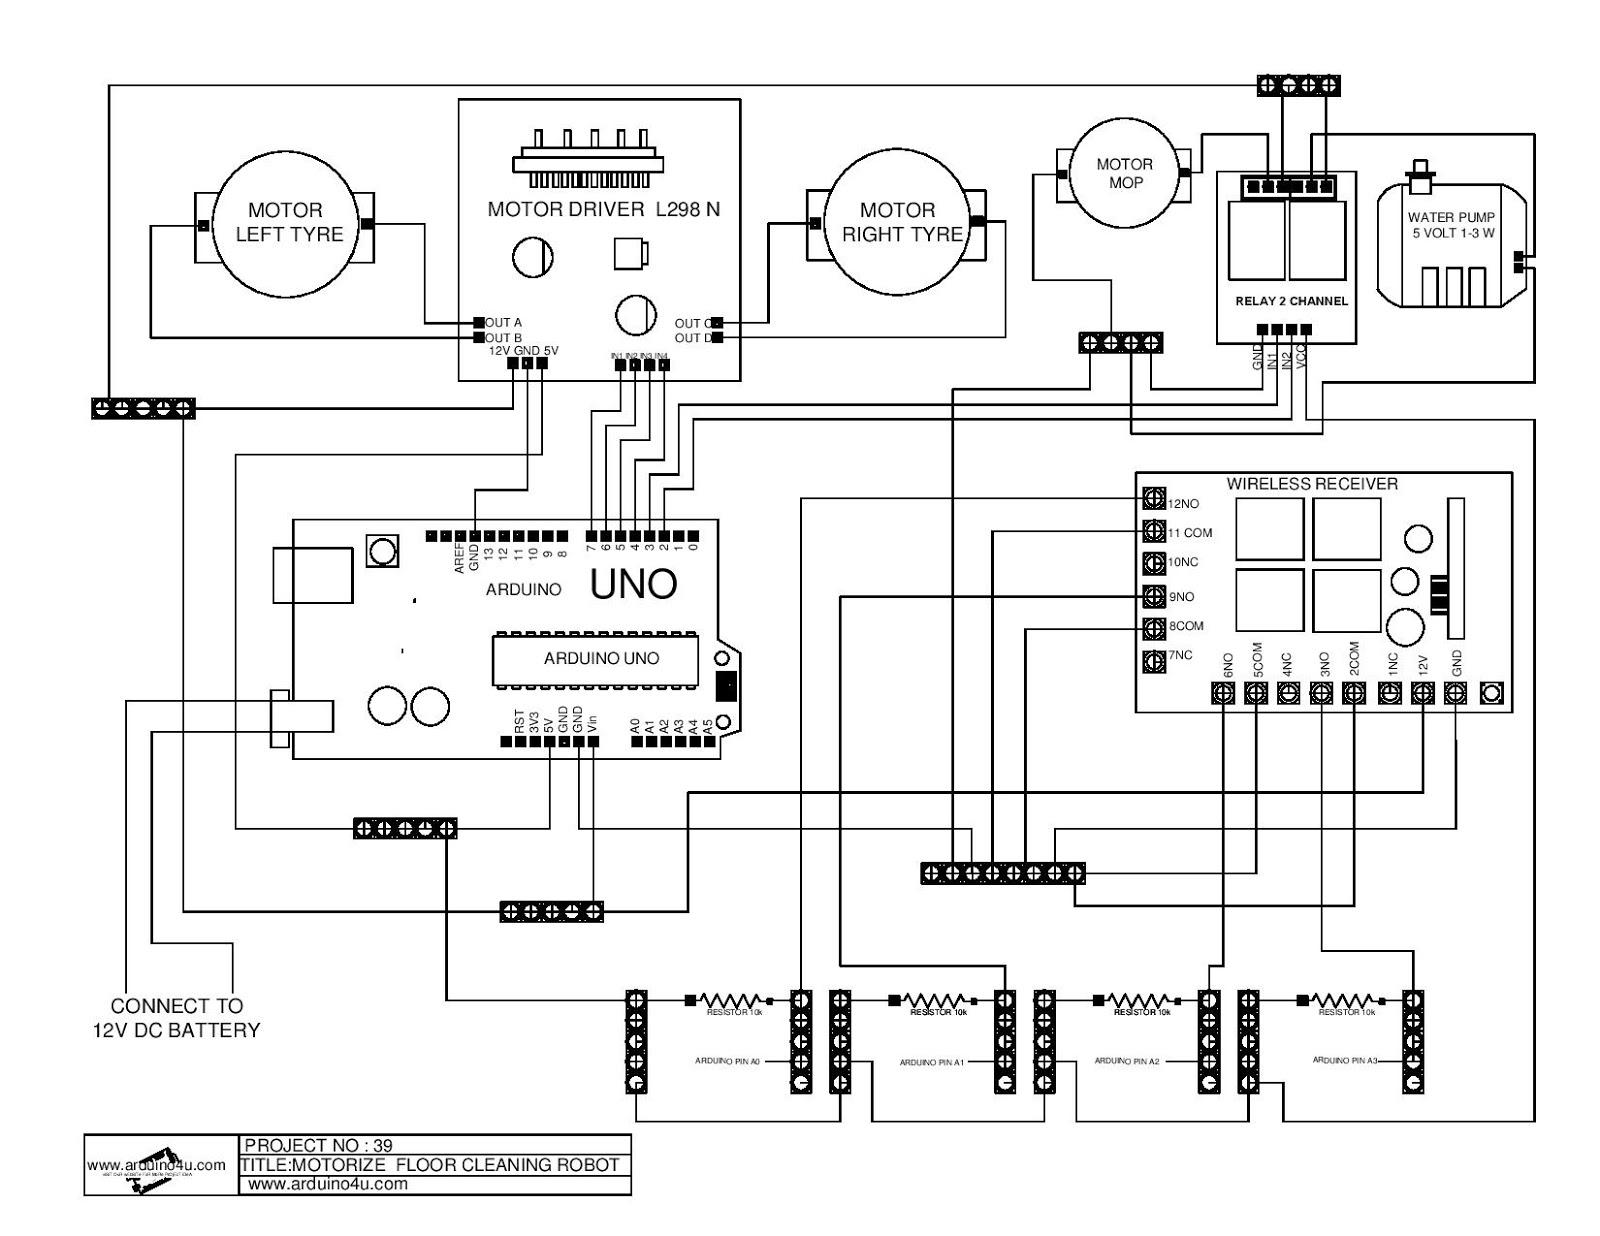 Projek Elektronik Arduino4u 39p Cleaning Robot